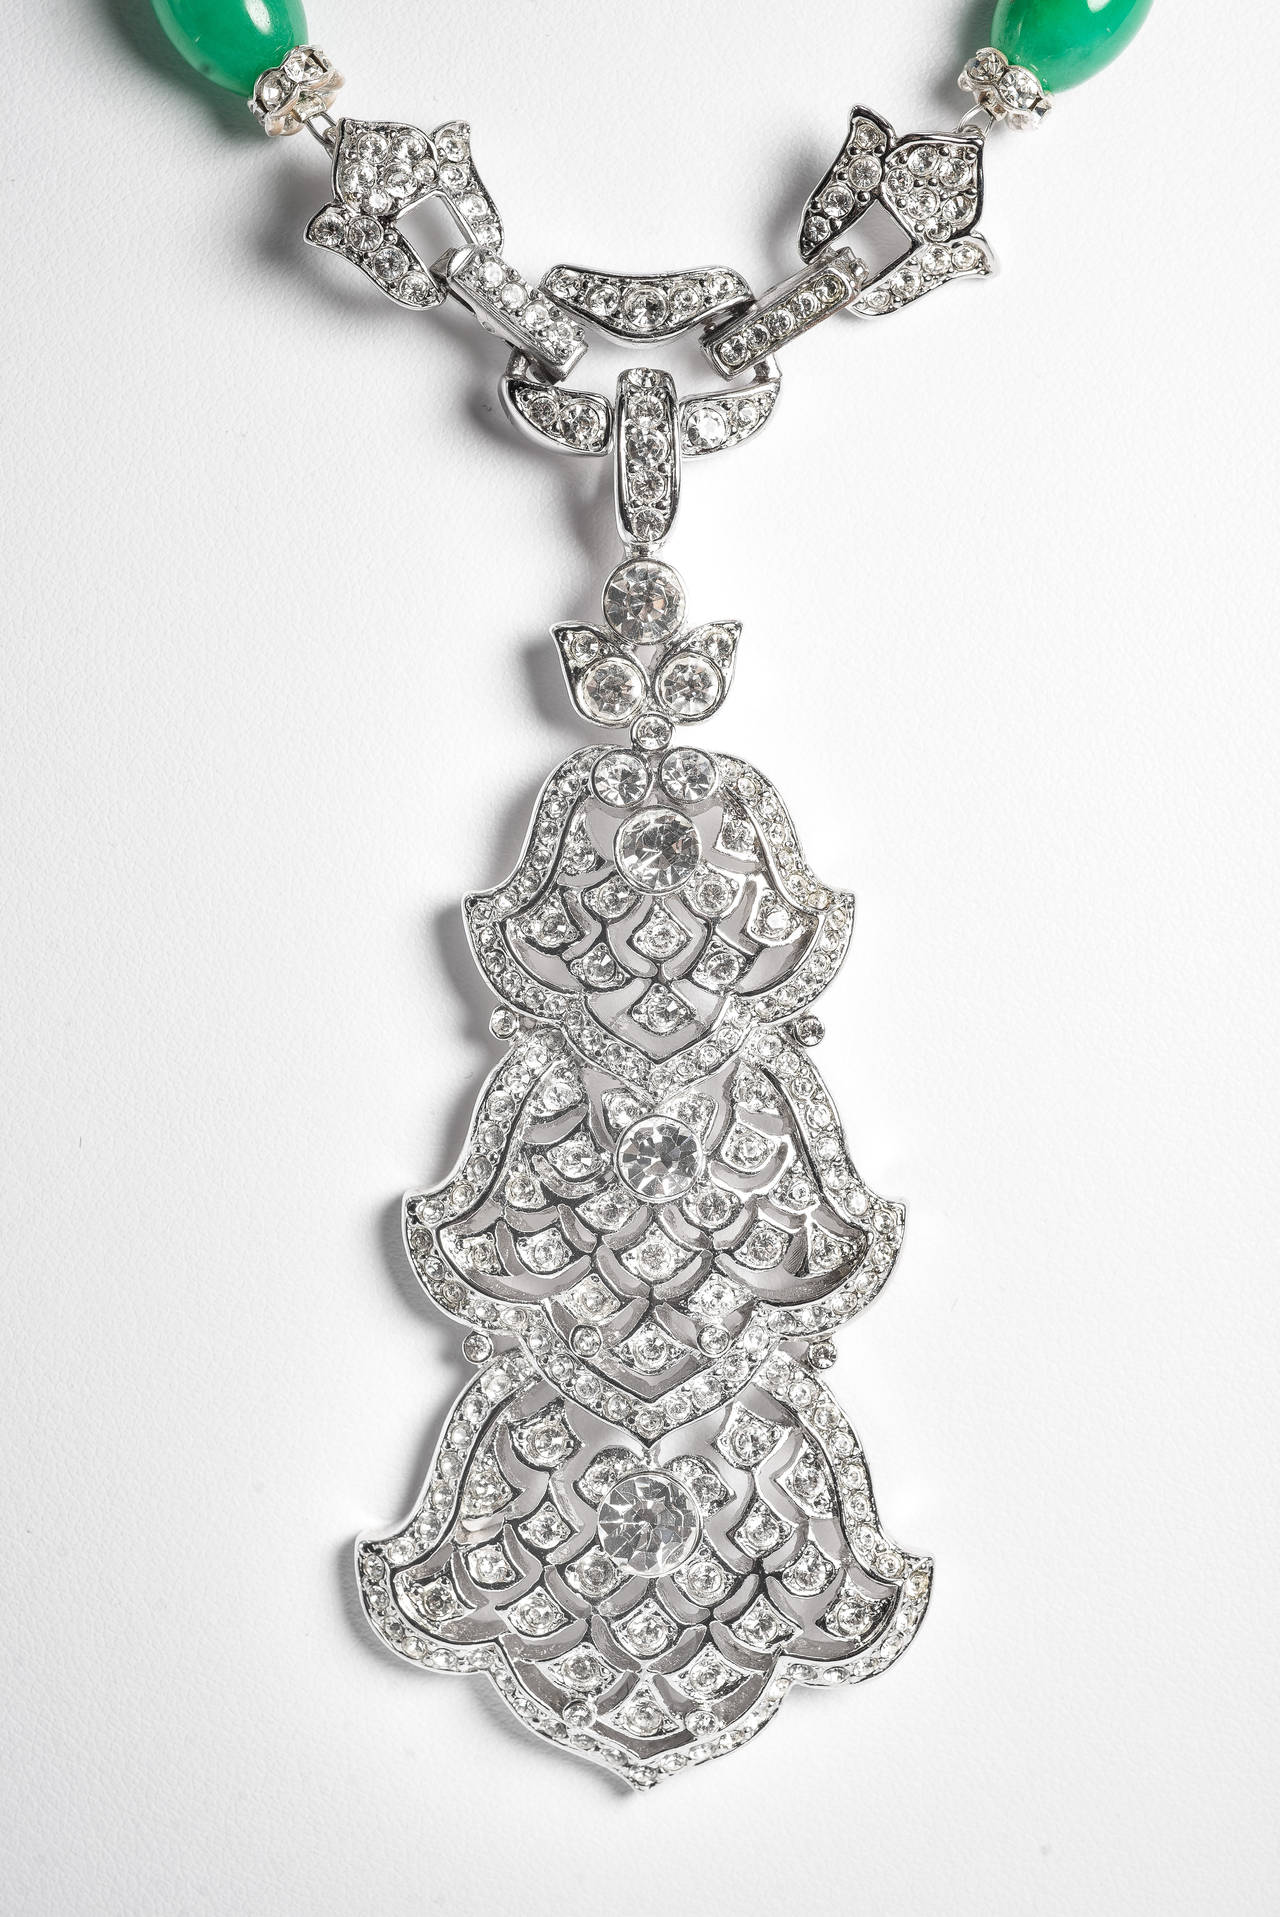 Amazing Art Deco Style Faux Diamond Jade Coral Long Necklace 2